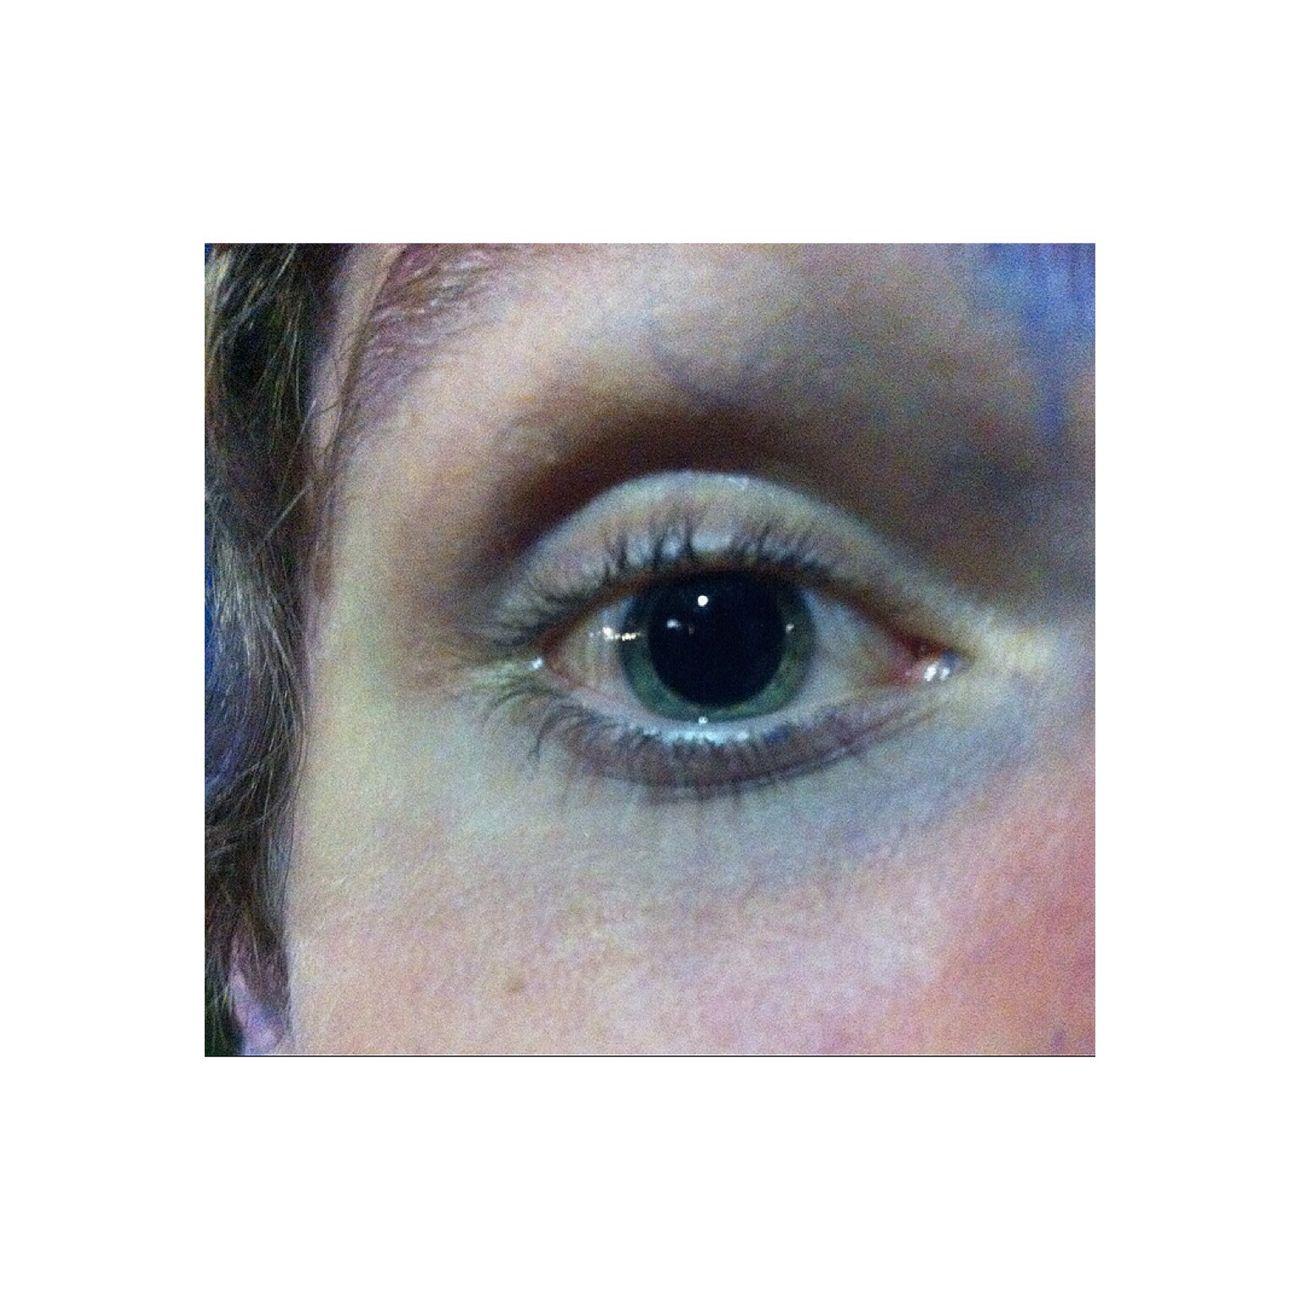 Amd Extasy Drogue pupille dilaté.